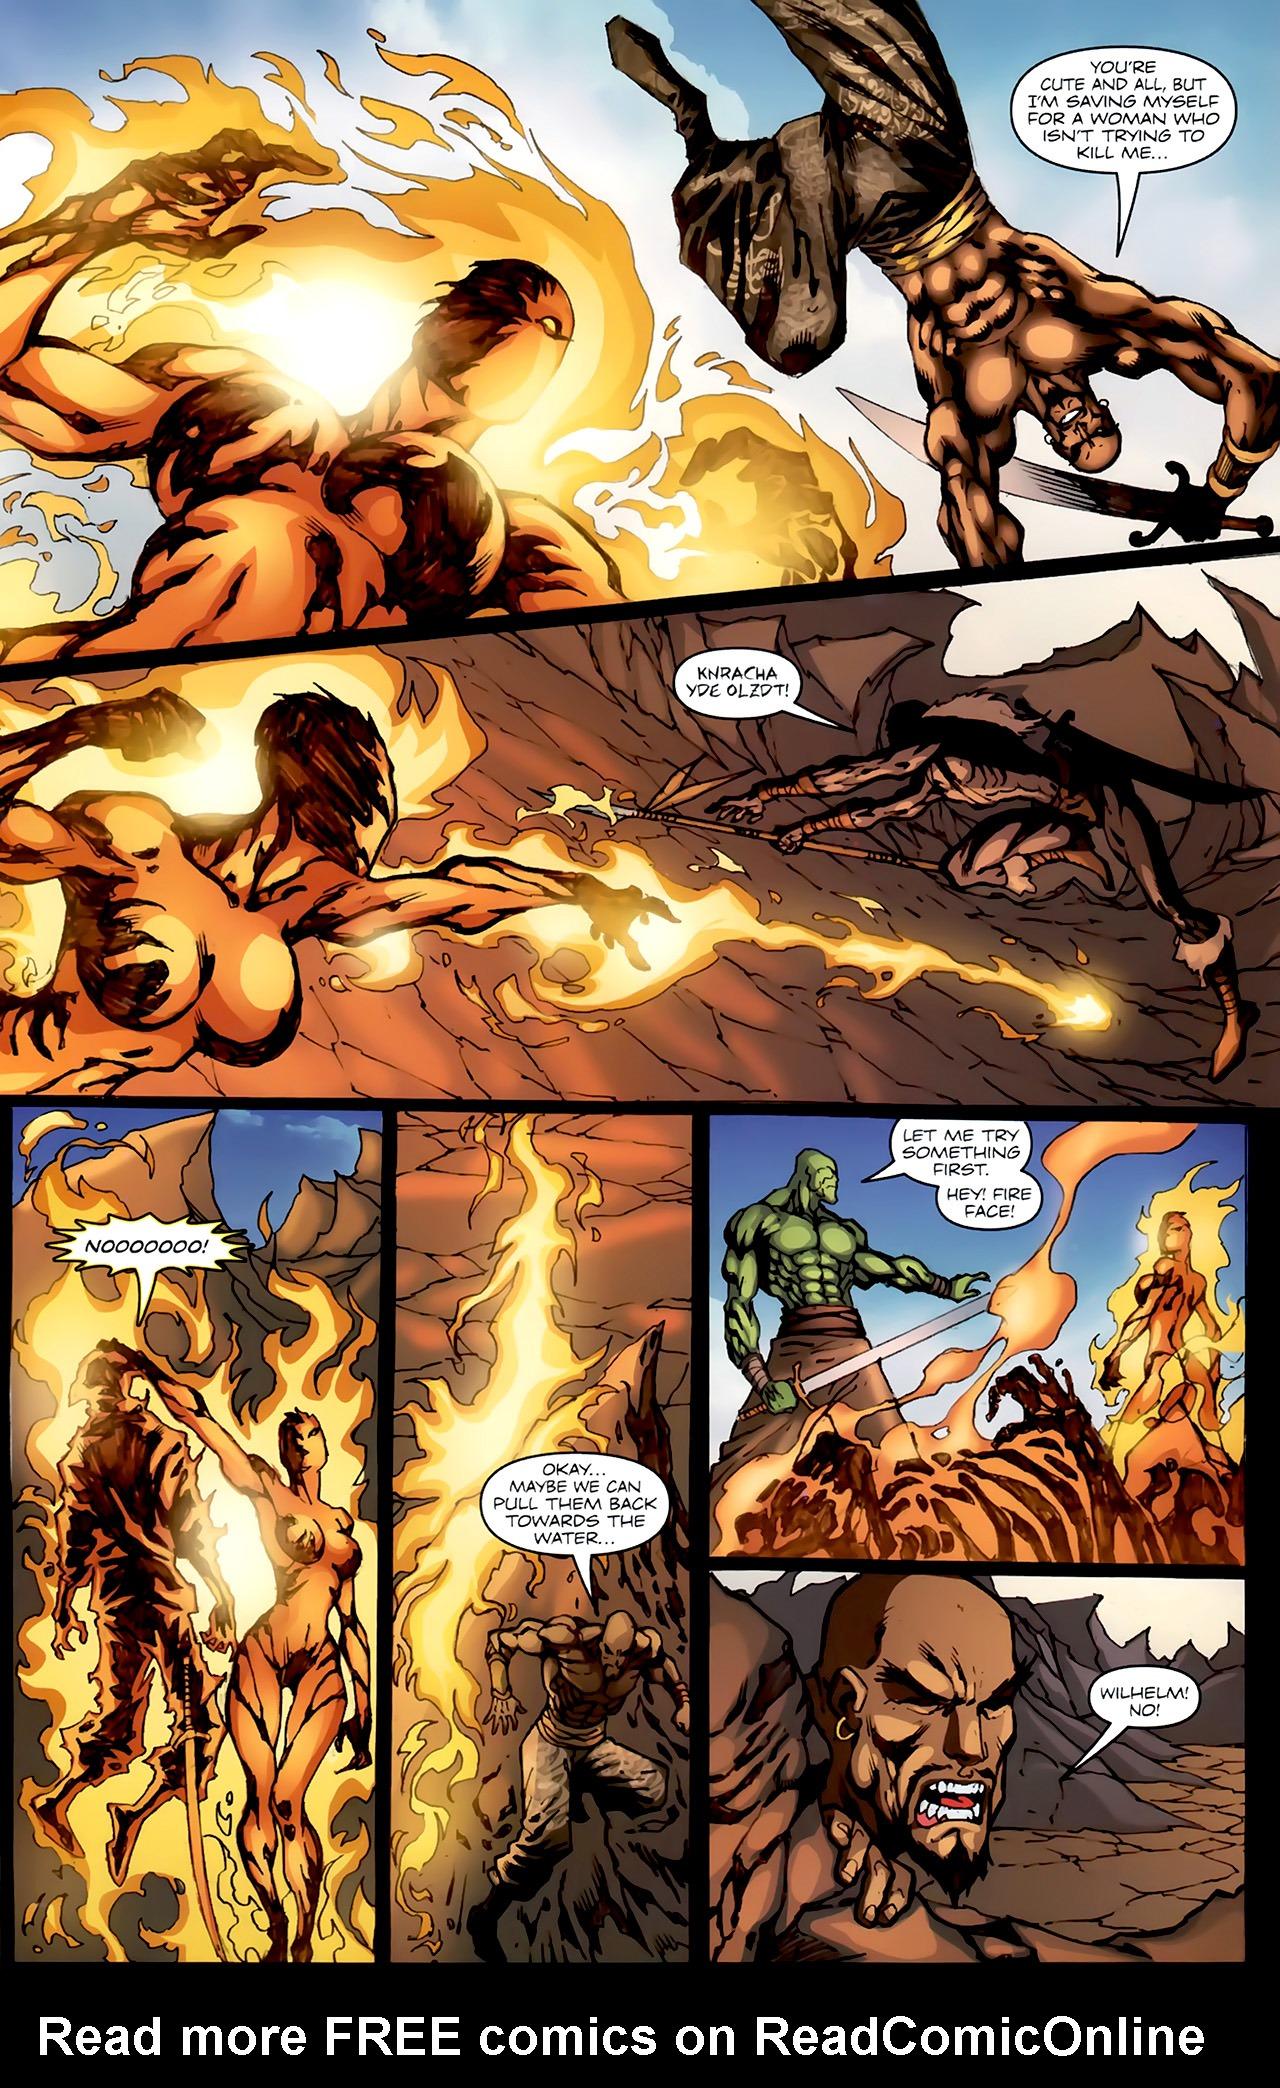 Read online 1001 Arabian Nights: The Adventures of Sinbad comic -  Issue #4 - 16